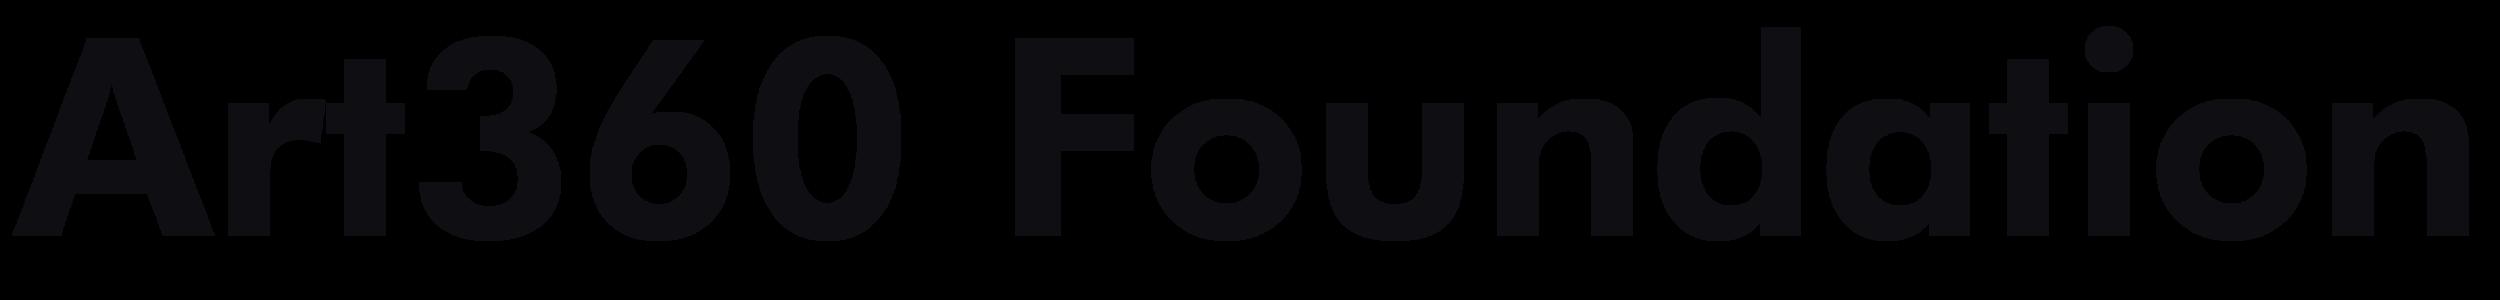 17-11-28 Art360 Foundation logo-01.png